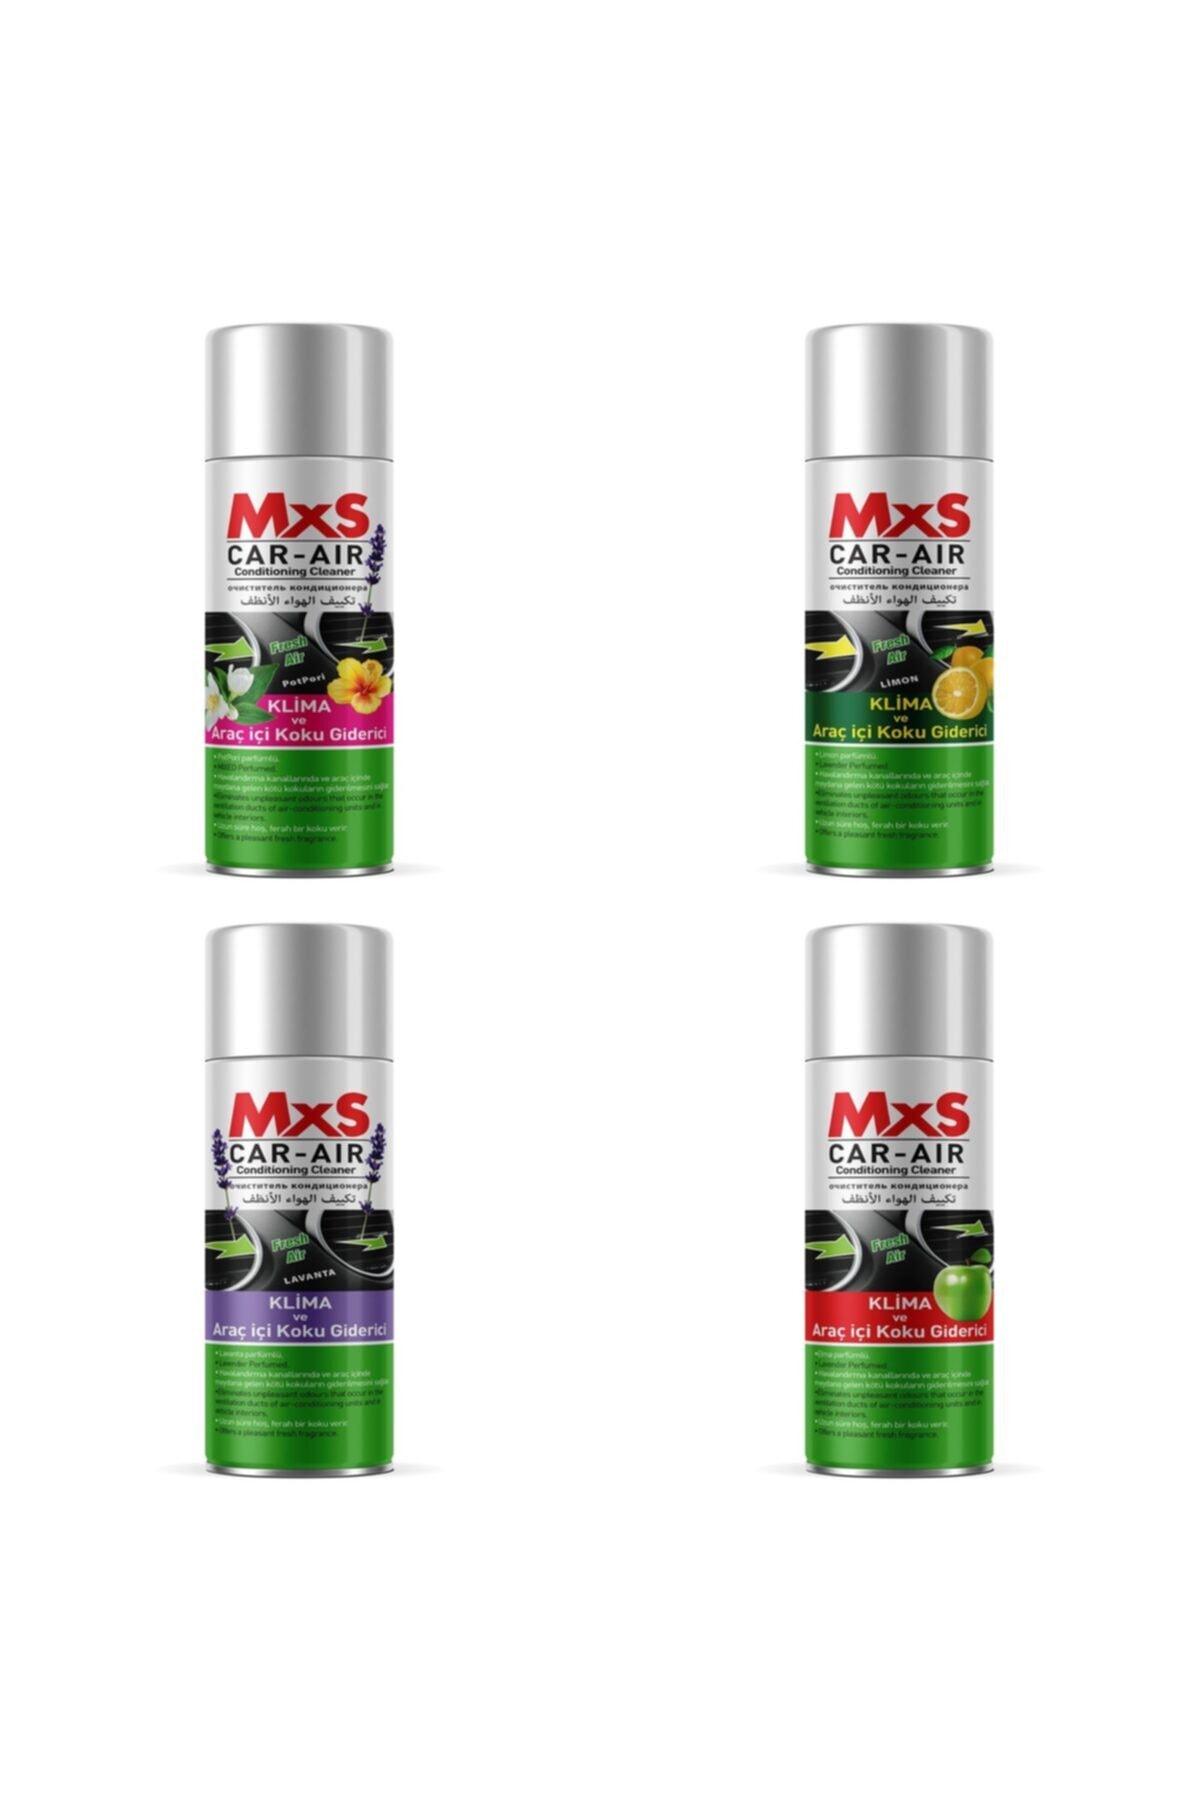 MxS Fresh Koku Bomba Araç Içi Ve Klima Koku Giderici Karma Kokulu 200 ml X4 Adet 1